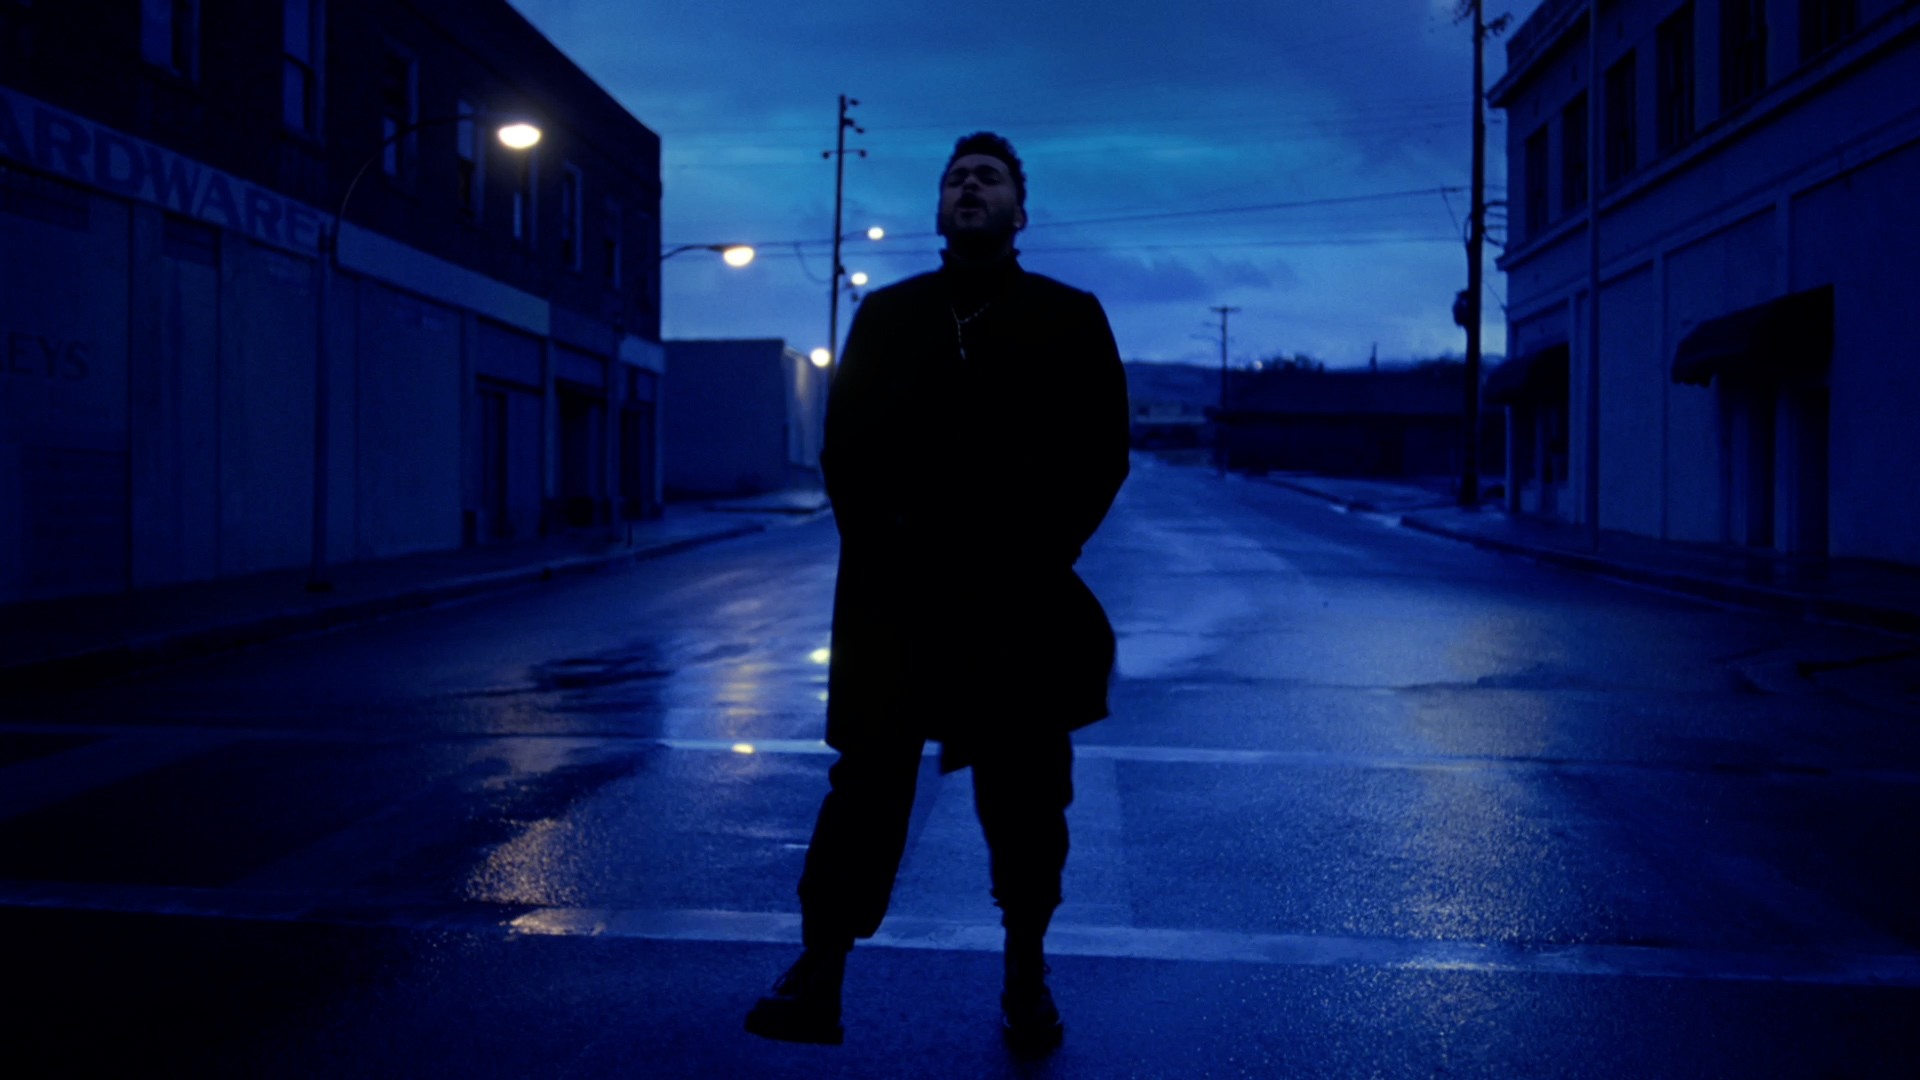 outdoor clothing street person man sky dark night